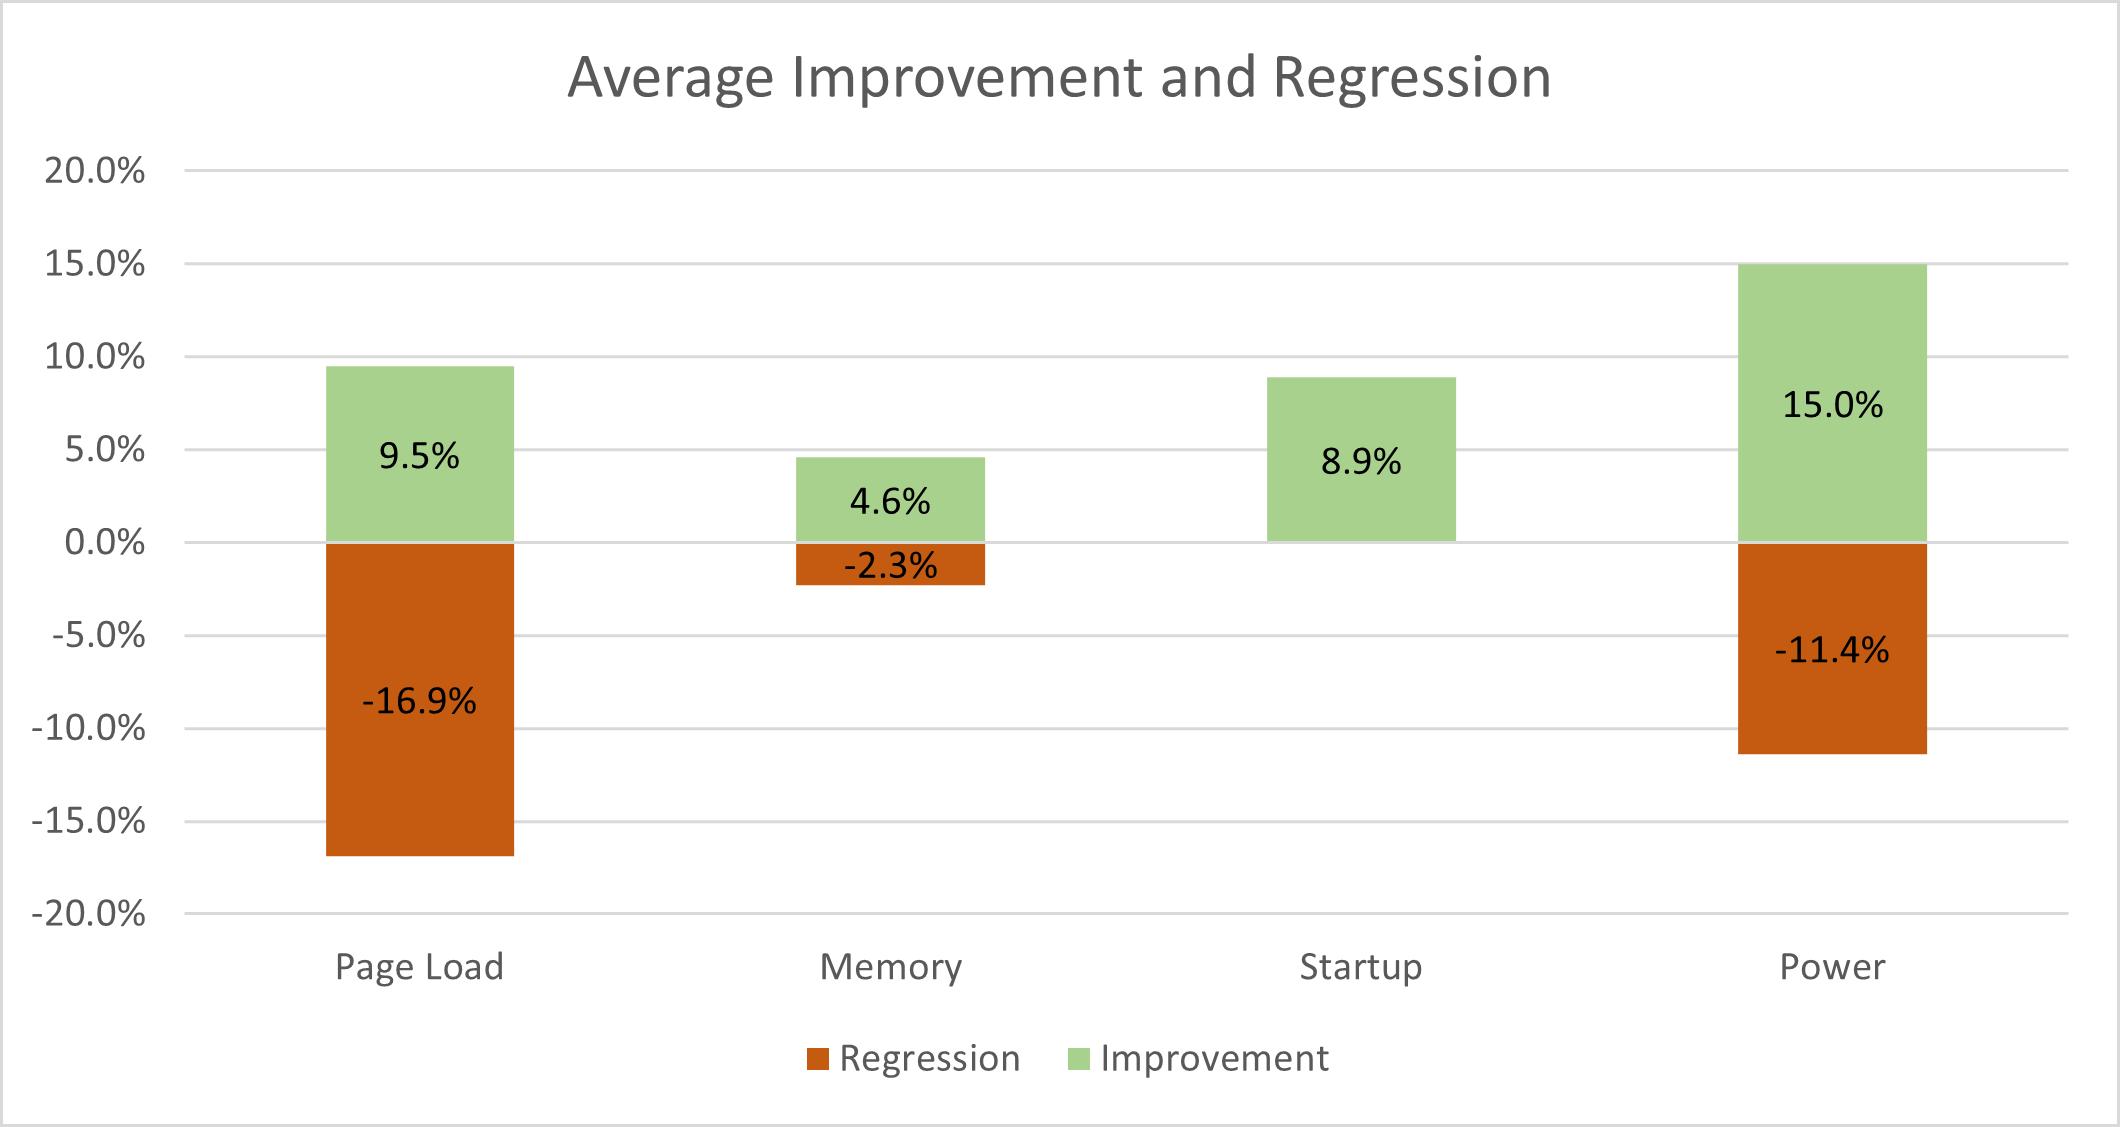 Average Improvement and Regression Chart